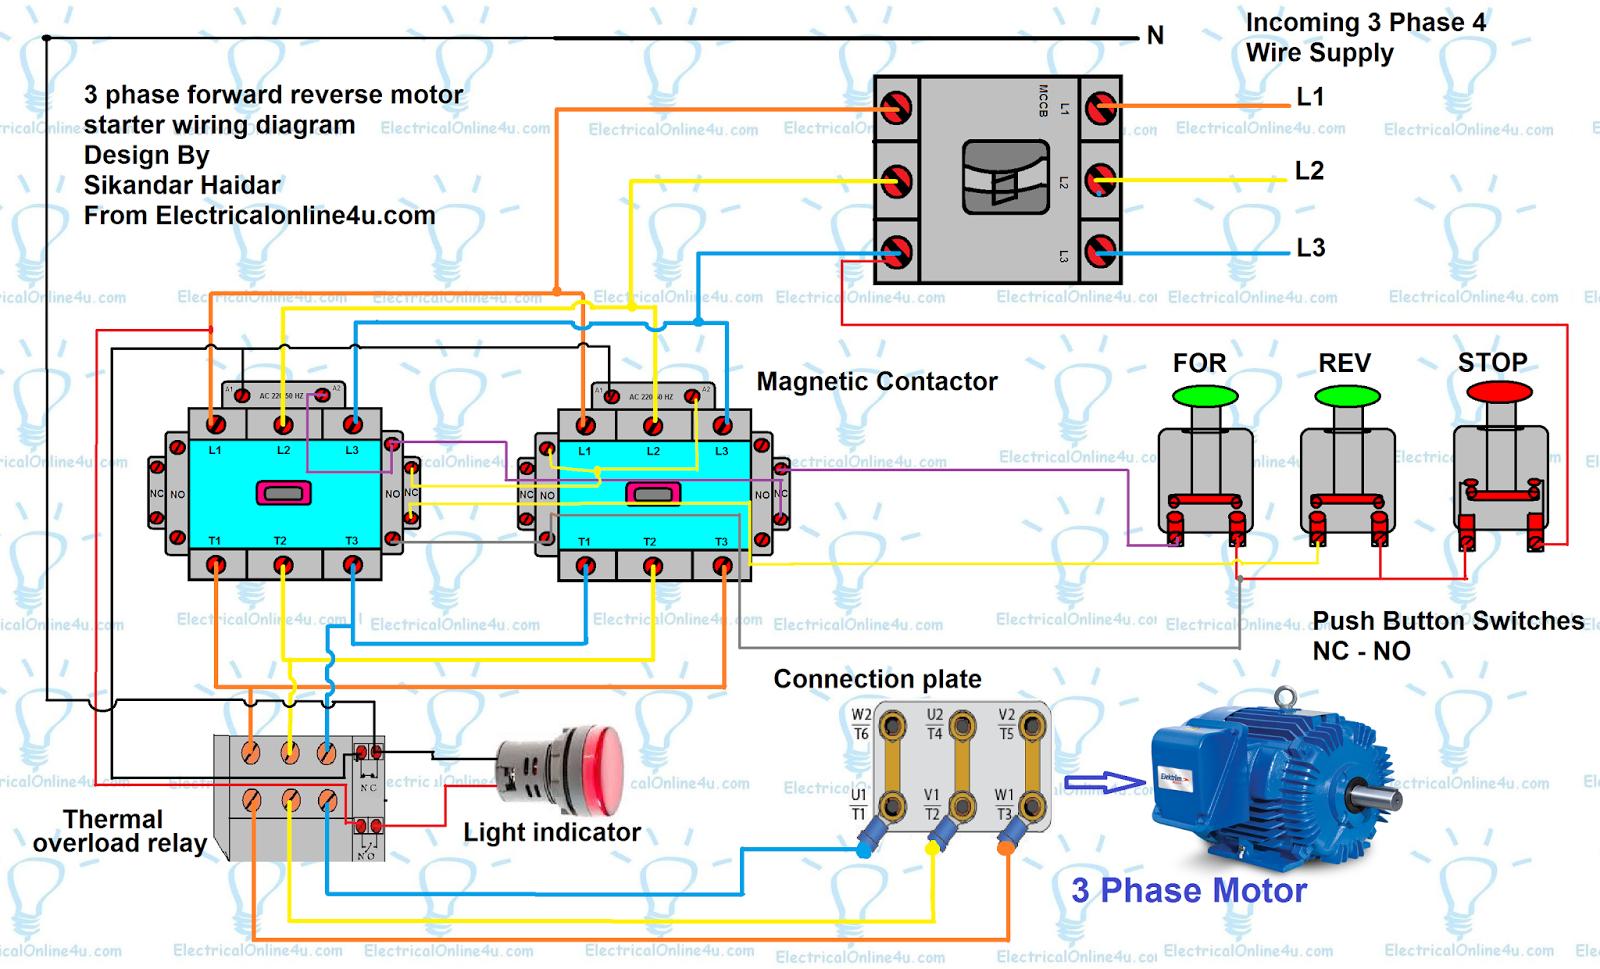 Forward Reverse Motor Control Diagram For 3 Phase Motor